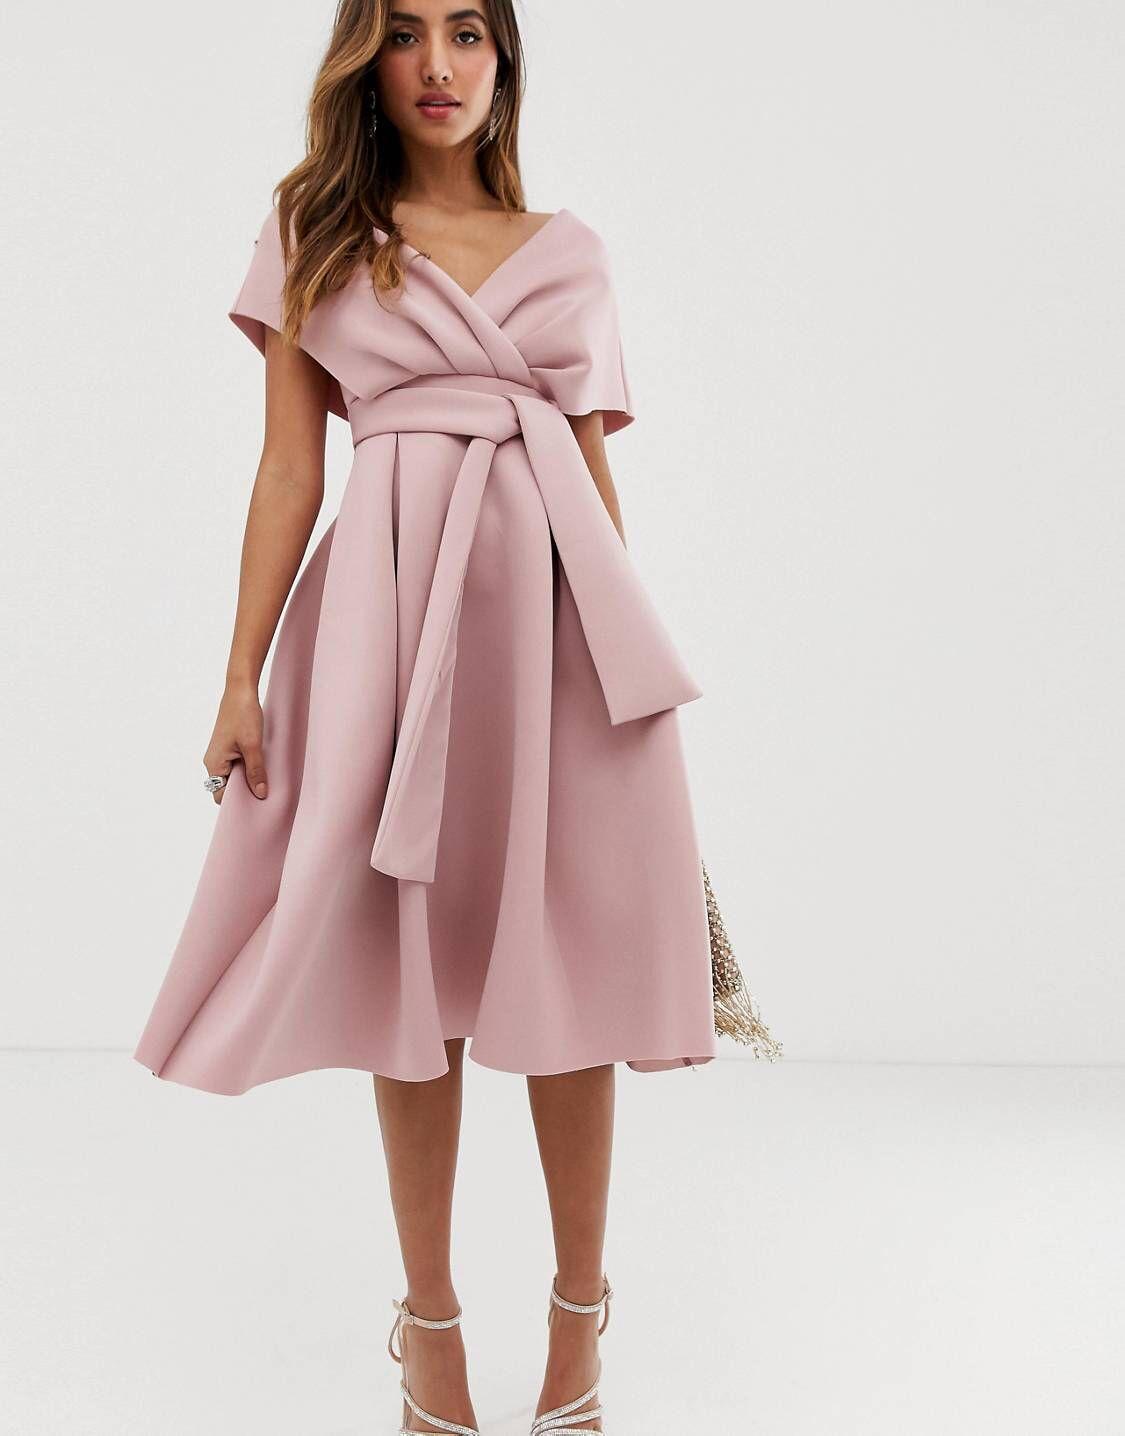 c9391cec6c9eb DESIGN Fallen Shoulder Prom Dress with Tie Detail in 2019 | Wear it ...